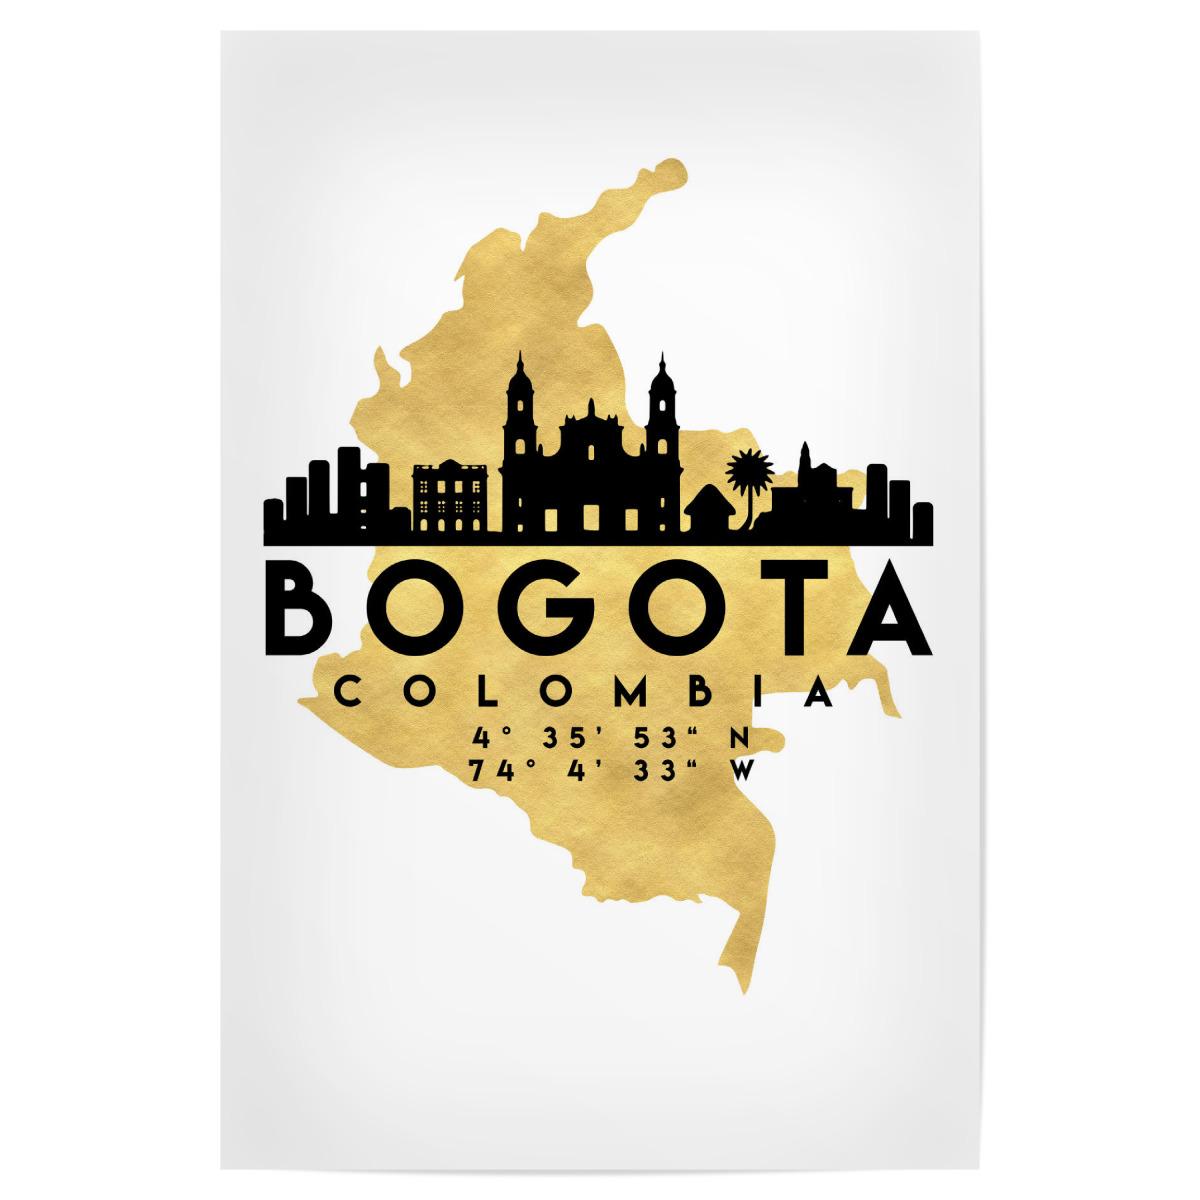 BOGOTA COLOMBIA SKYLINE MAP ART als Poster bei artboxONE kaufen